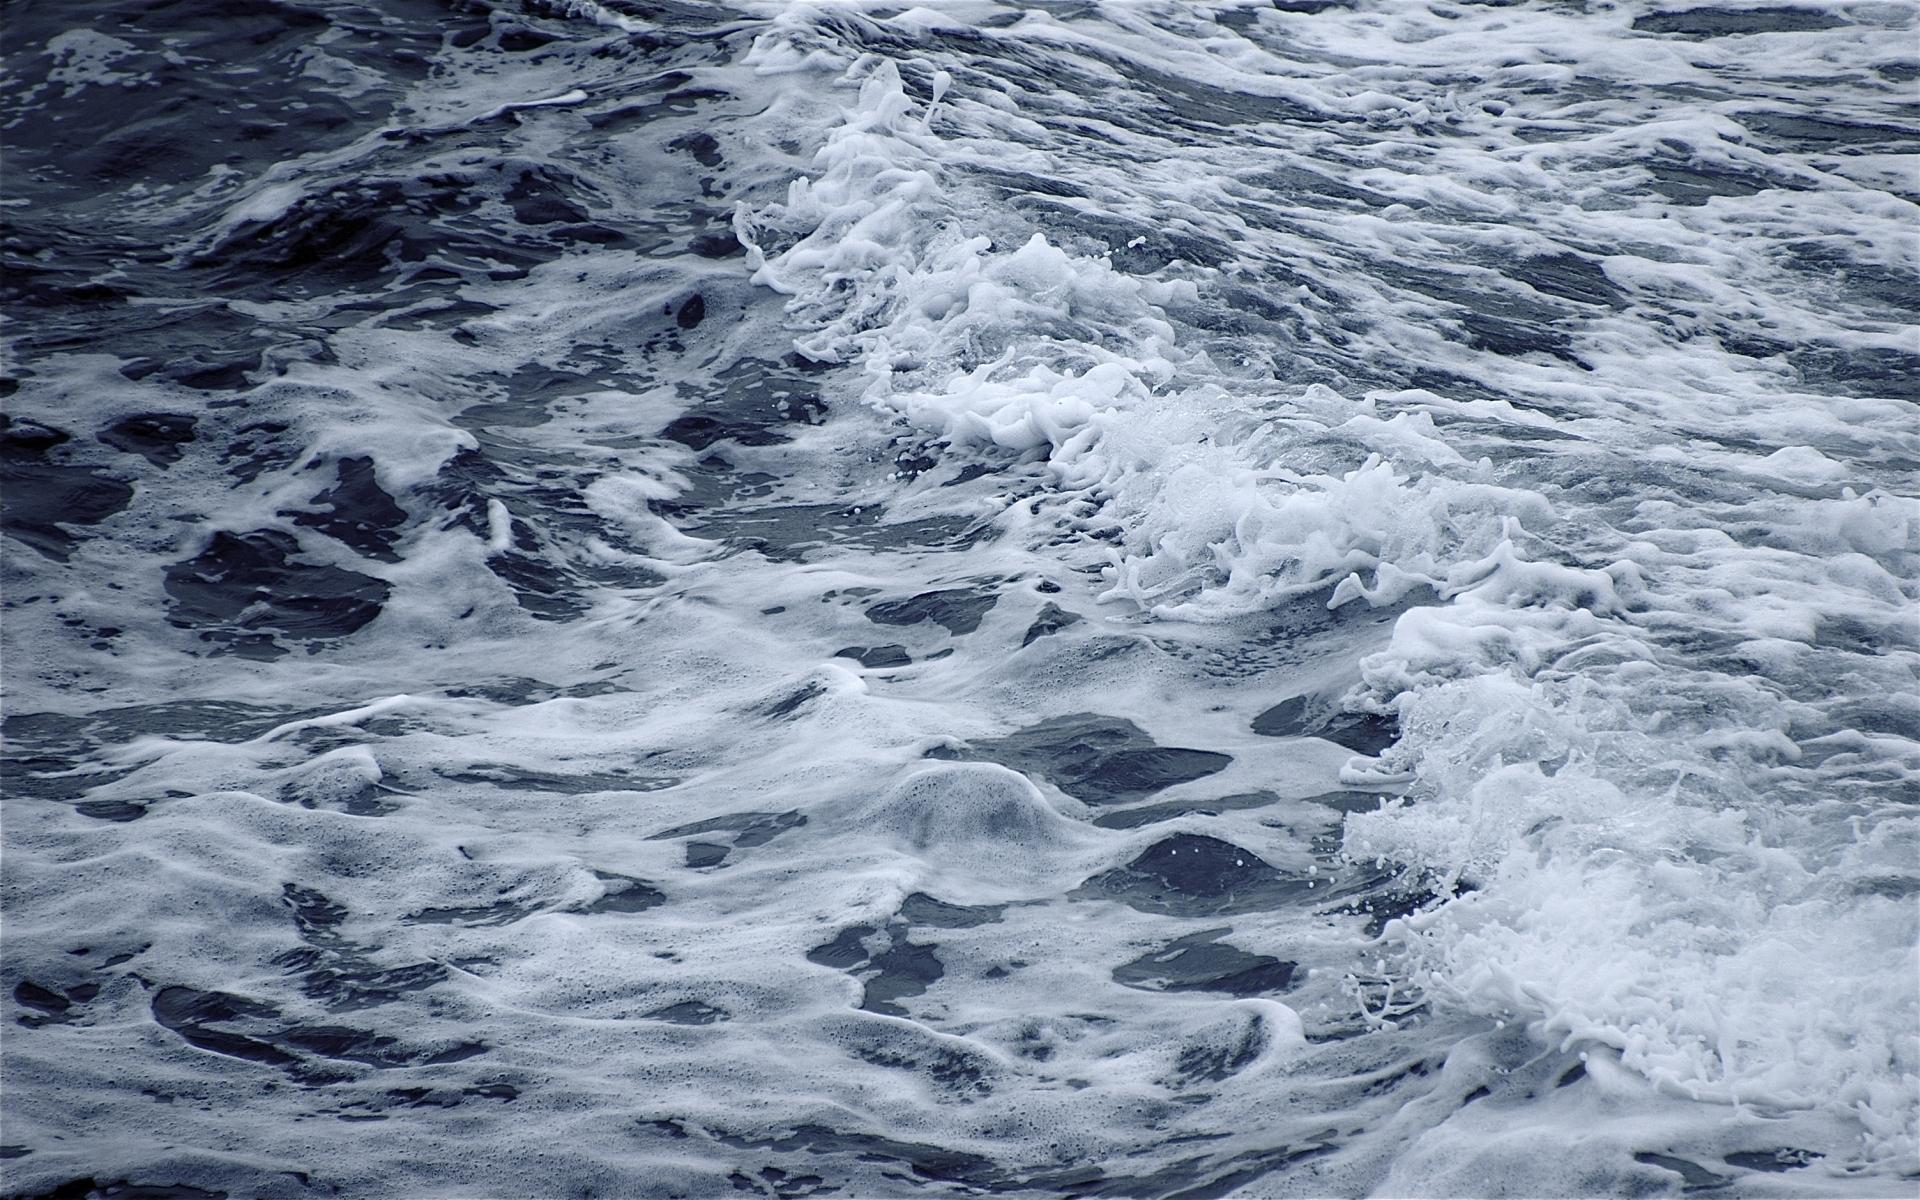 ocean waves wallpapers - HD Desktop Wallpapers   4k HD